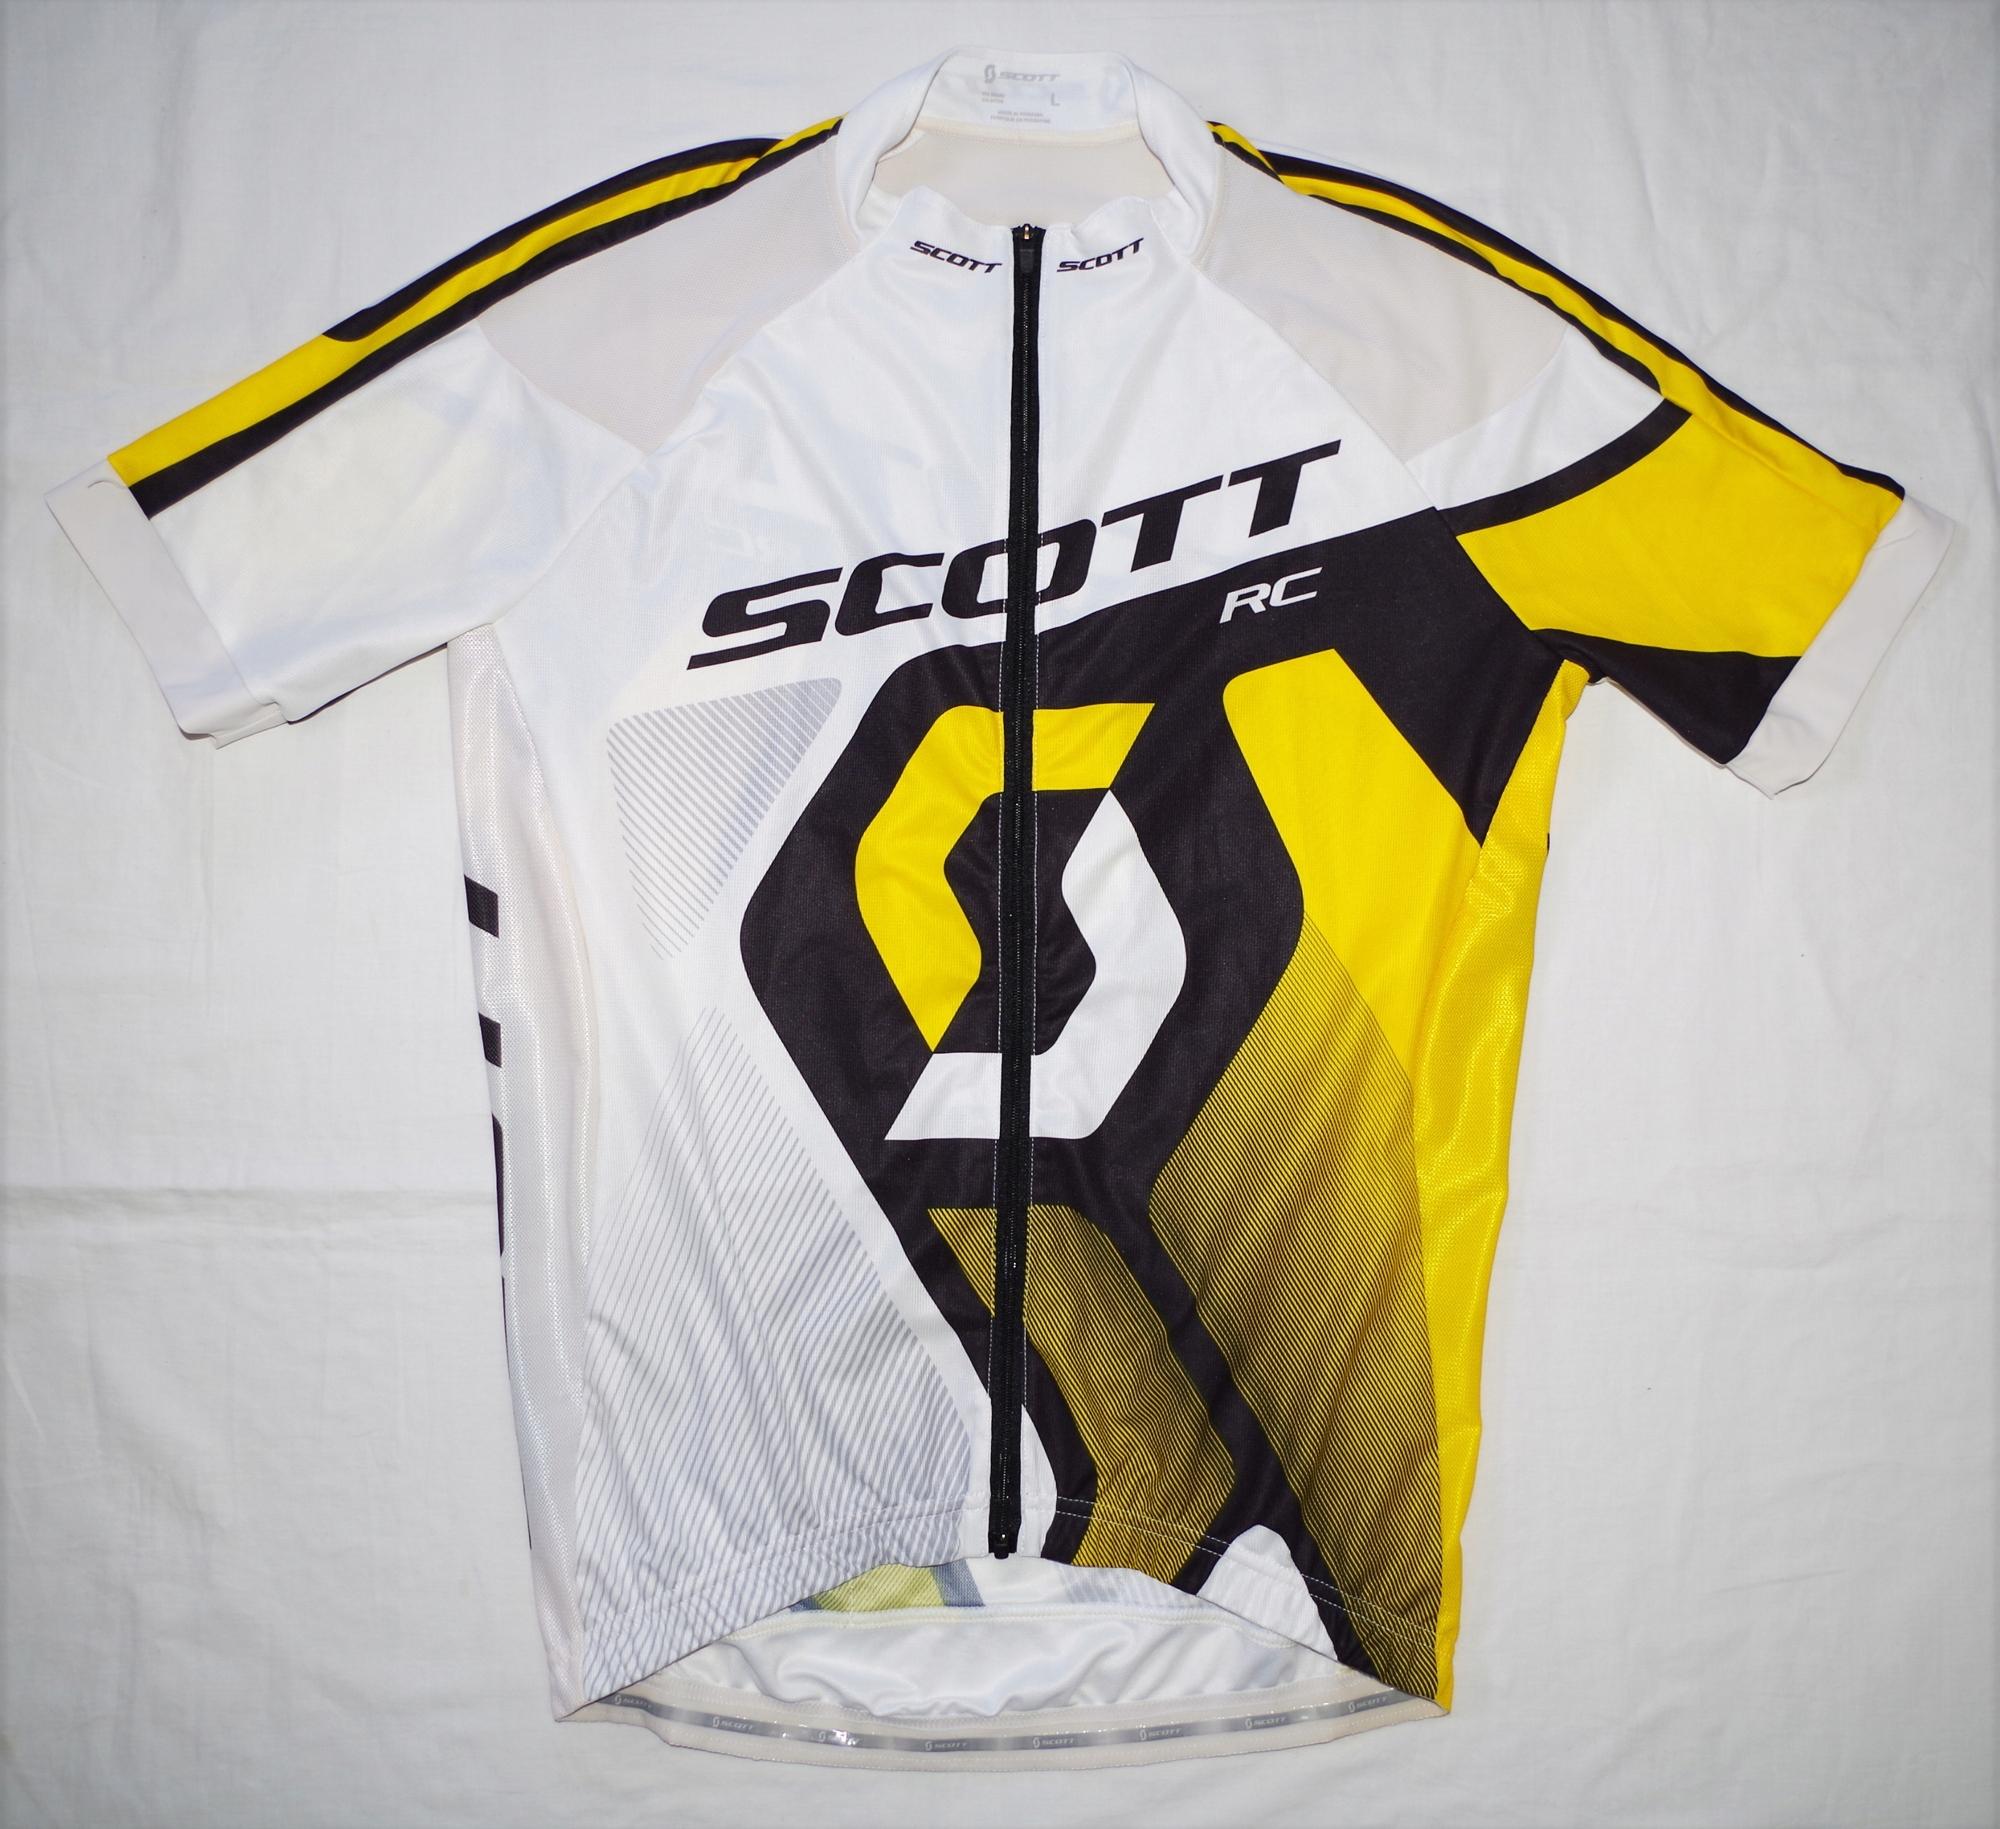 SCOTT RACING TEAM koszulka rowerowa kolarska L HIT